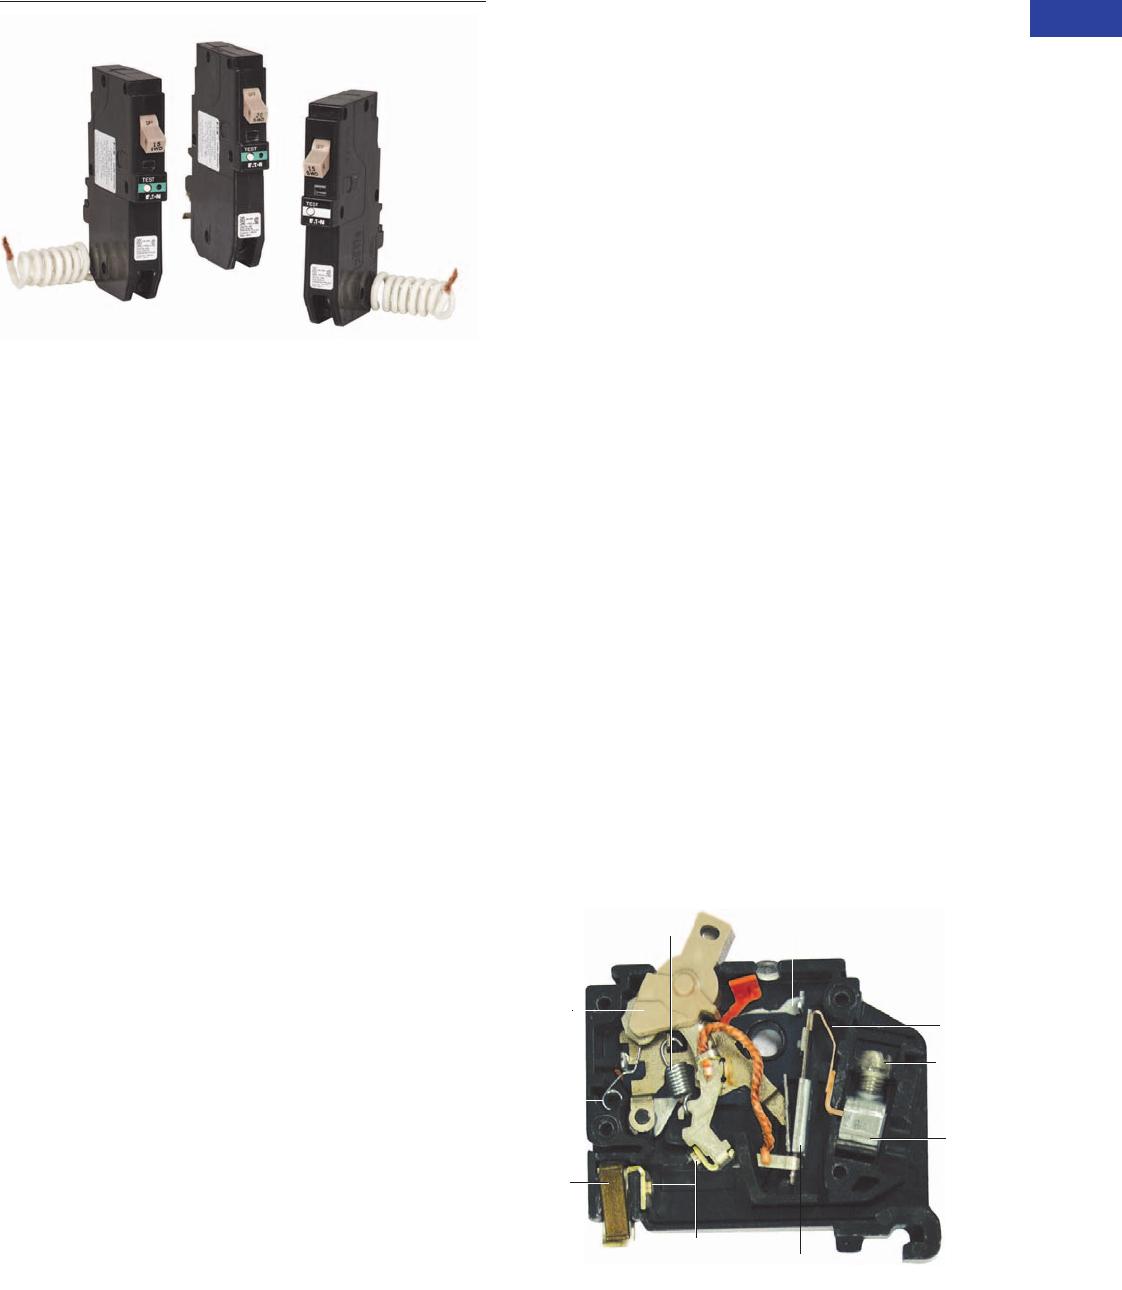 Volume 01residential And Light Commercial 226188 Catalog Corporation Br120af Single Pole Arc Fault Circuit Breaker 20amp 1residential Ca08100002eseptember 2014 Eatoncom V1 T1 31